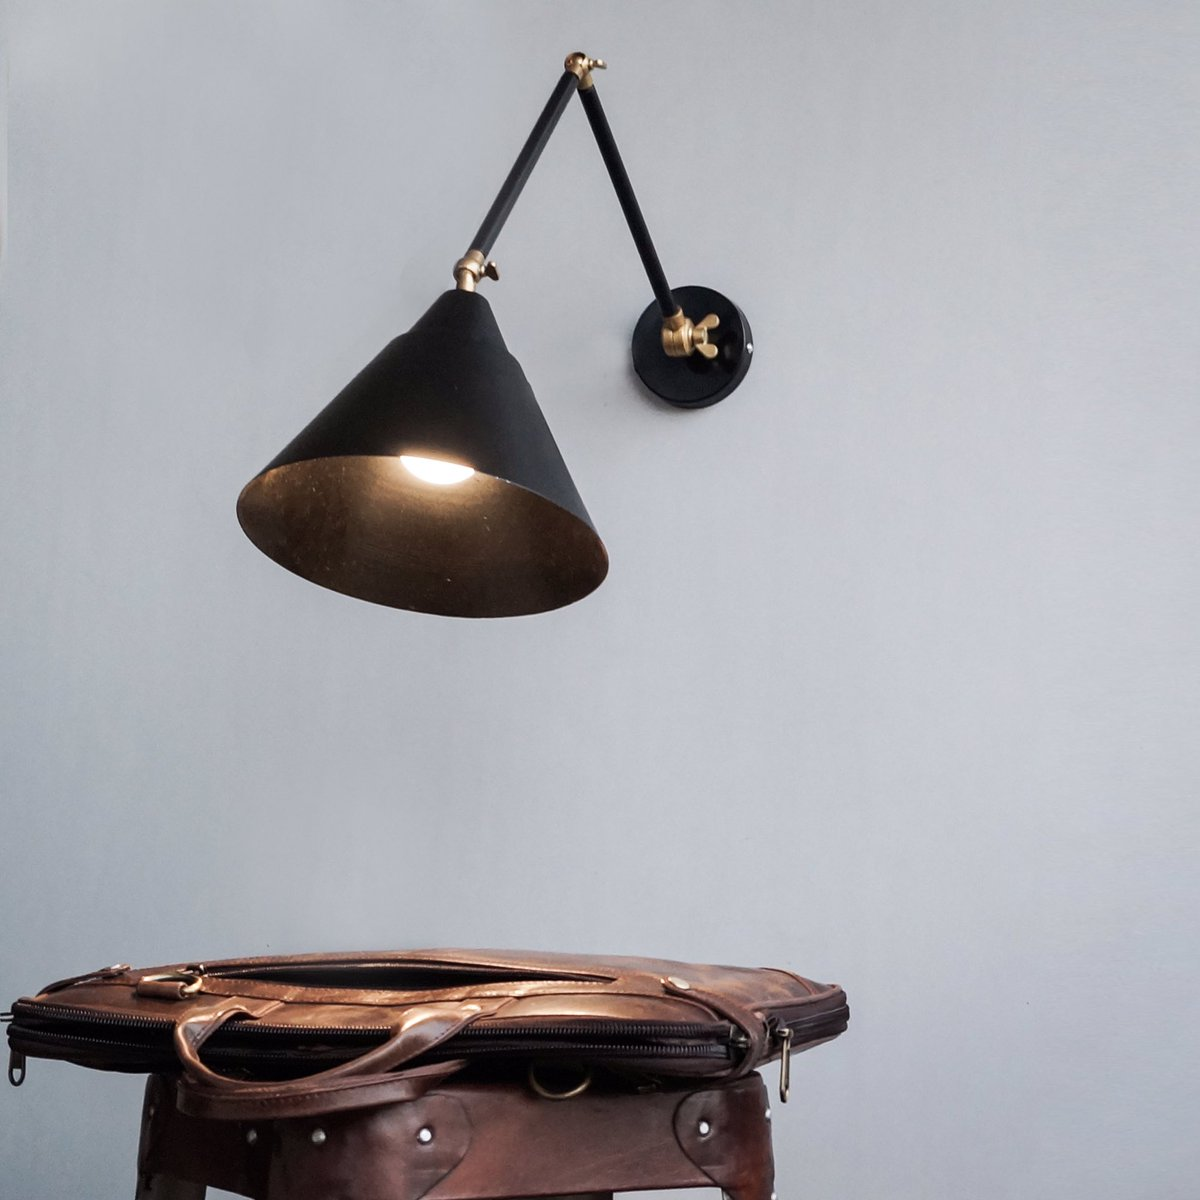 The executive club wall sconce #lamps #industriallamps #decor #home #interiordesign #interiorismo #interiordesign<br>http://pic.twitter.com/tI6c5G9j7n